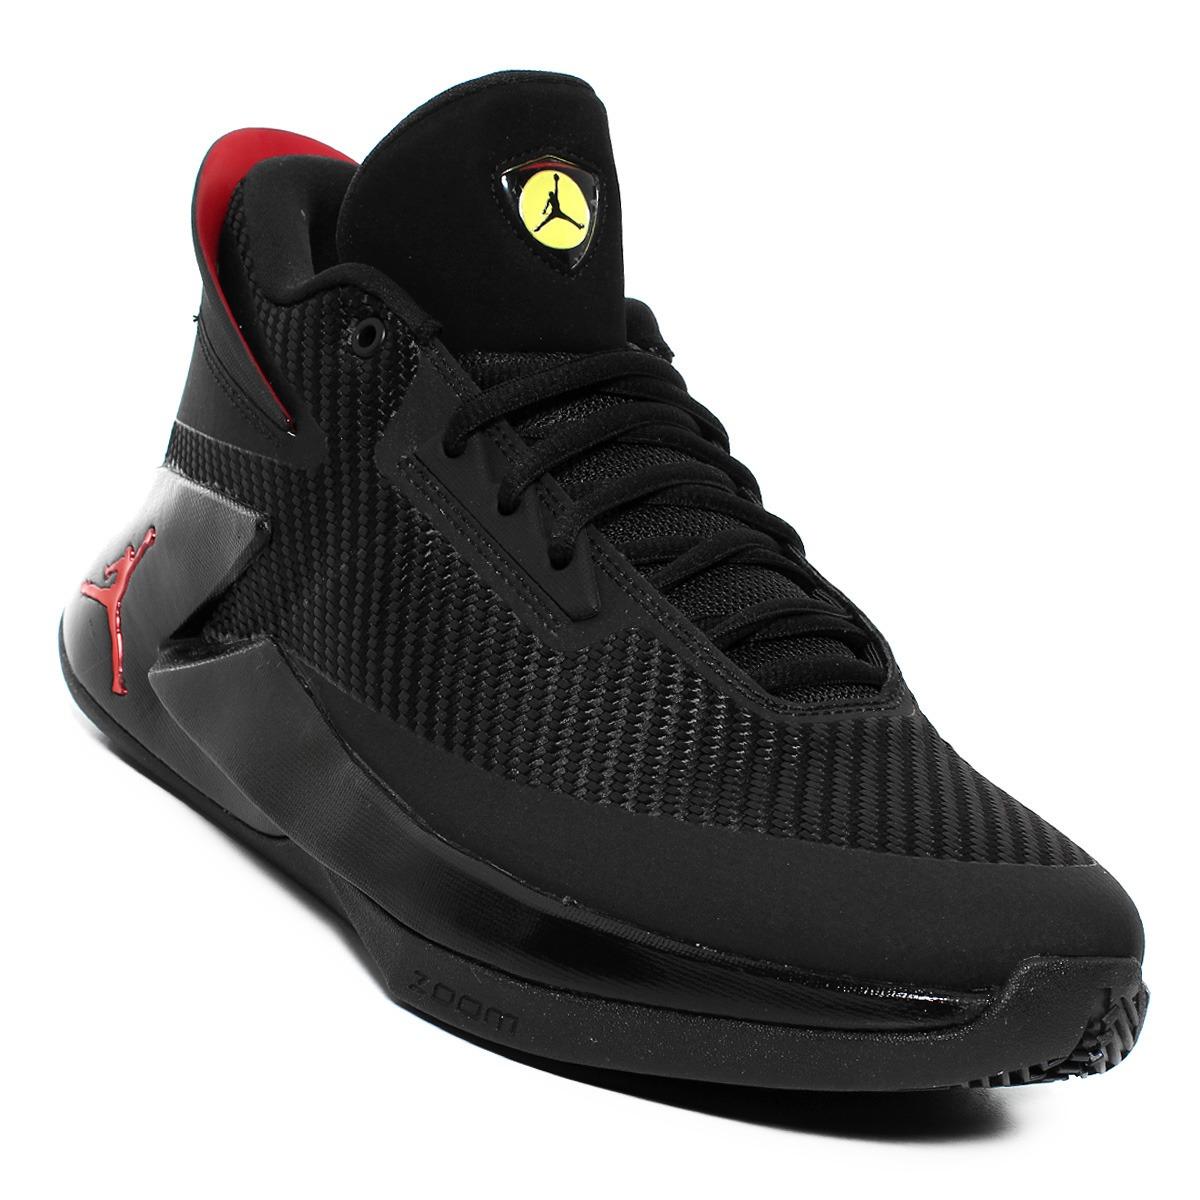 ed250060833c3 zapatillas nike jordan fly lockdown black basquet basket. Cargando zoom.